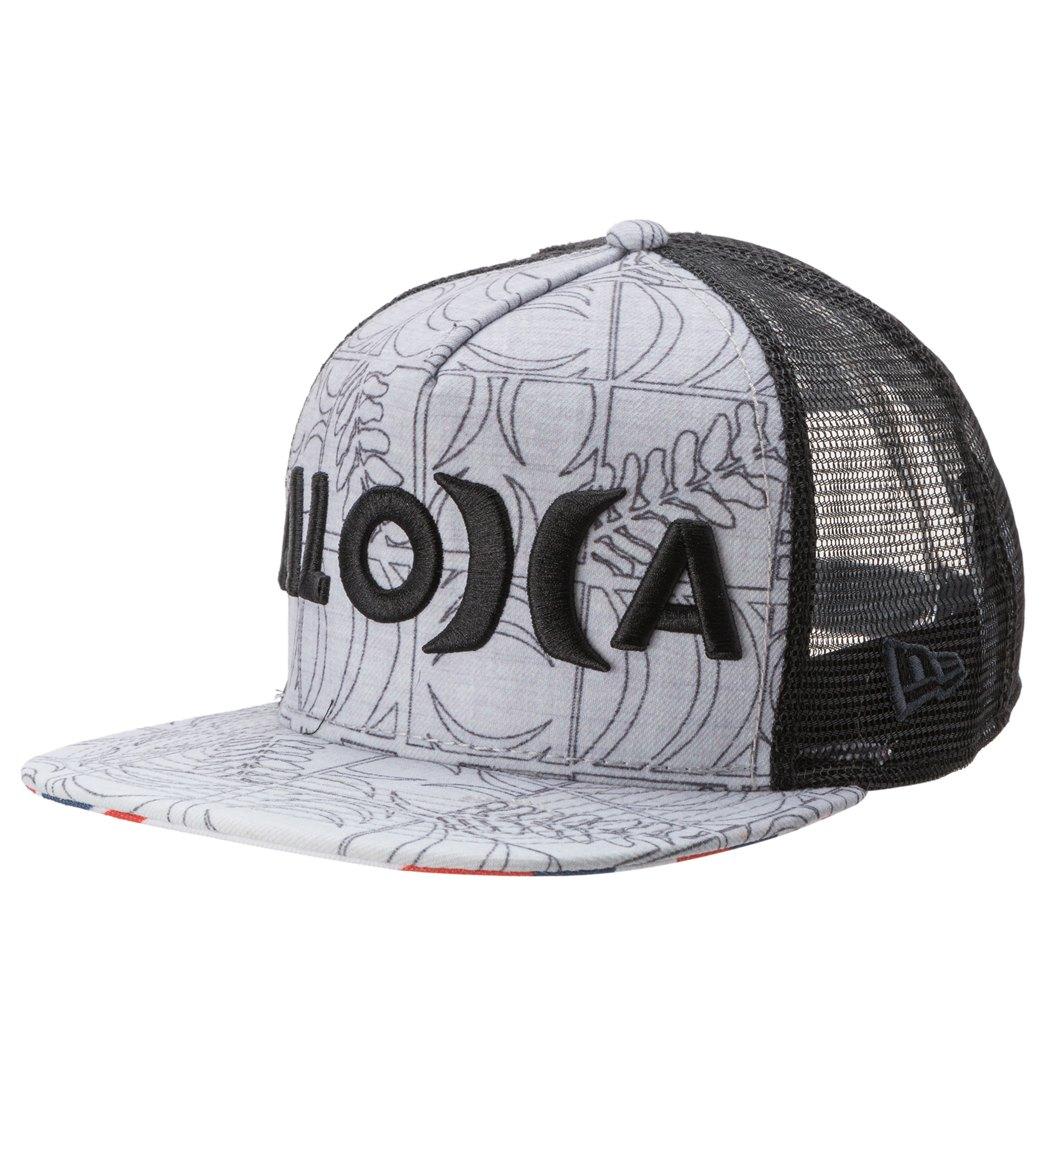 Hurley Men s Sig Zane Eolakoa Trucker Hat at SwimOutlet.com 334ce8792563